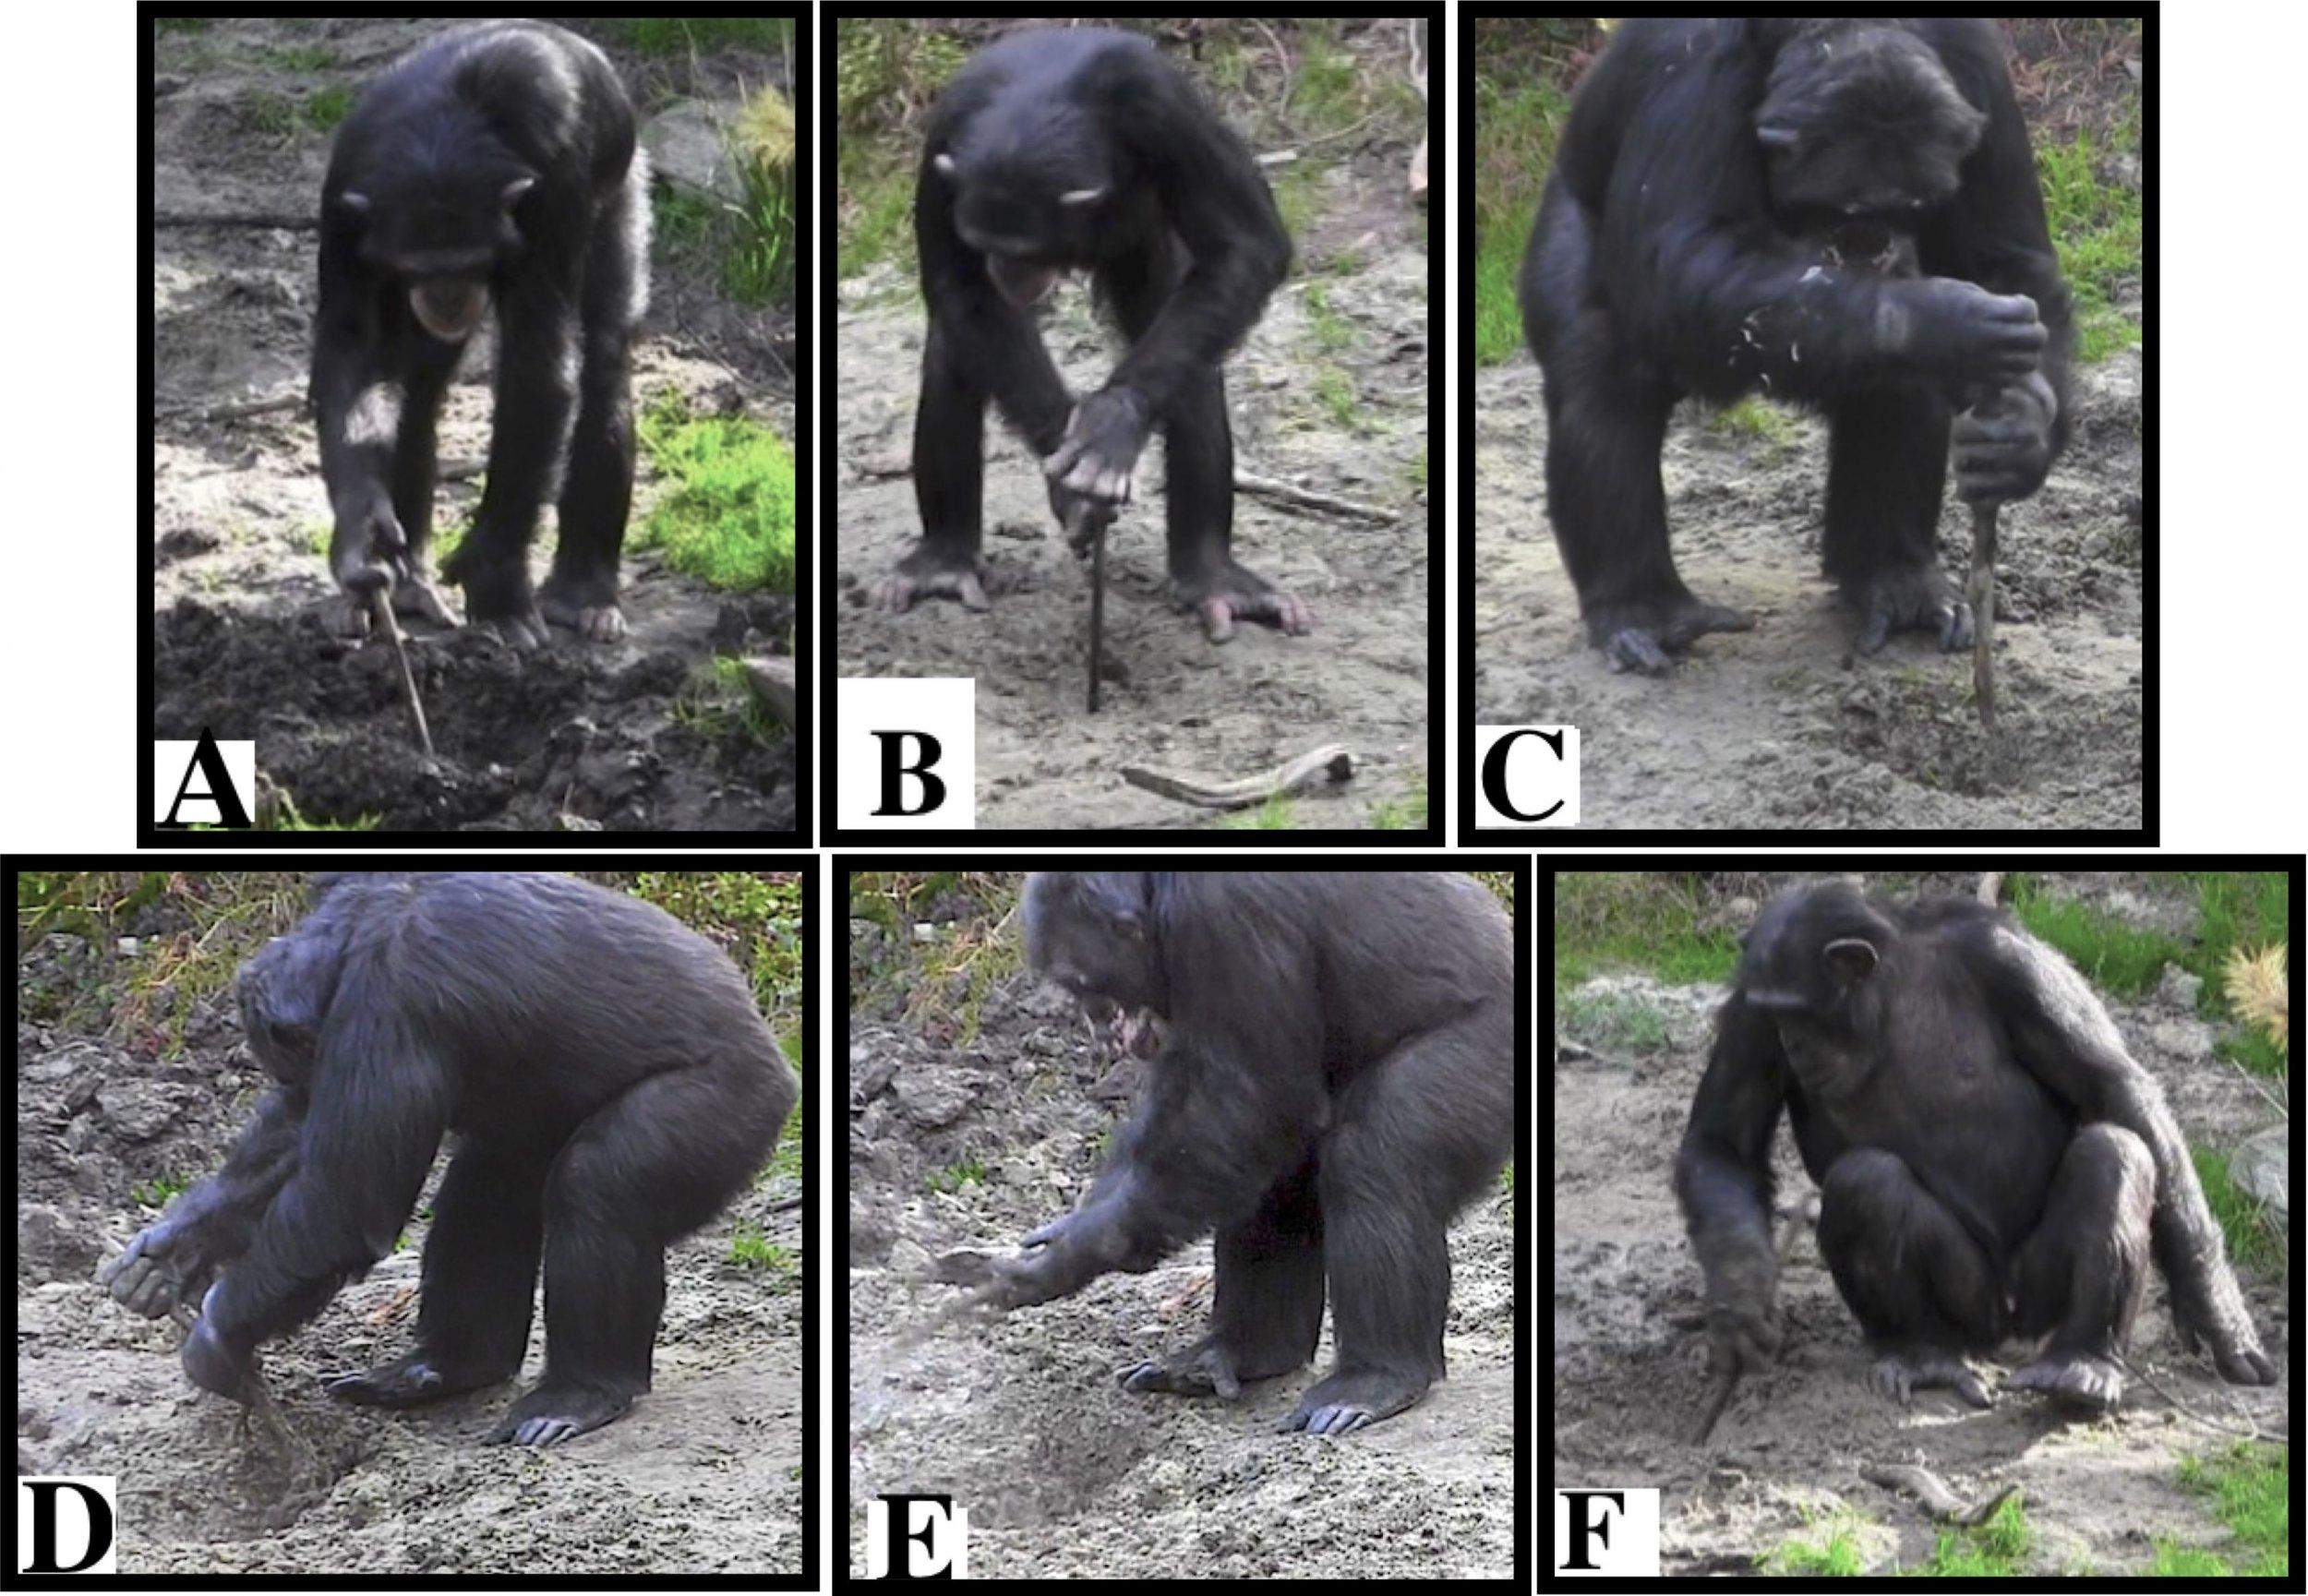 chimpanzees, tool use